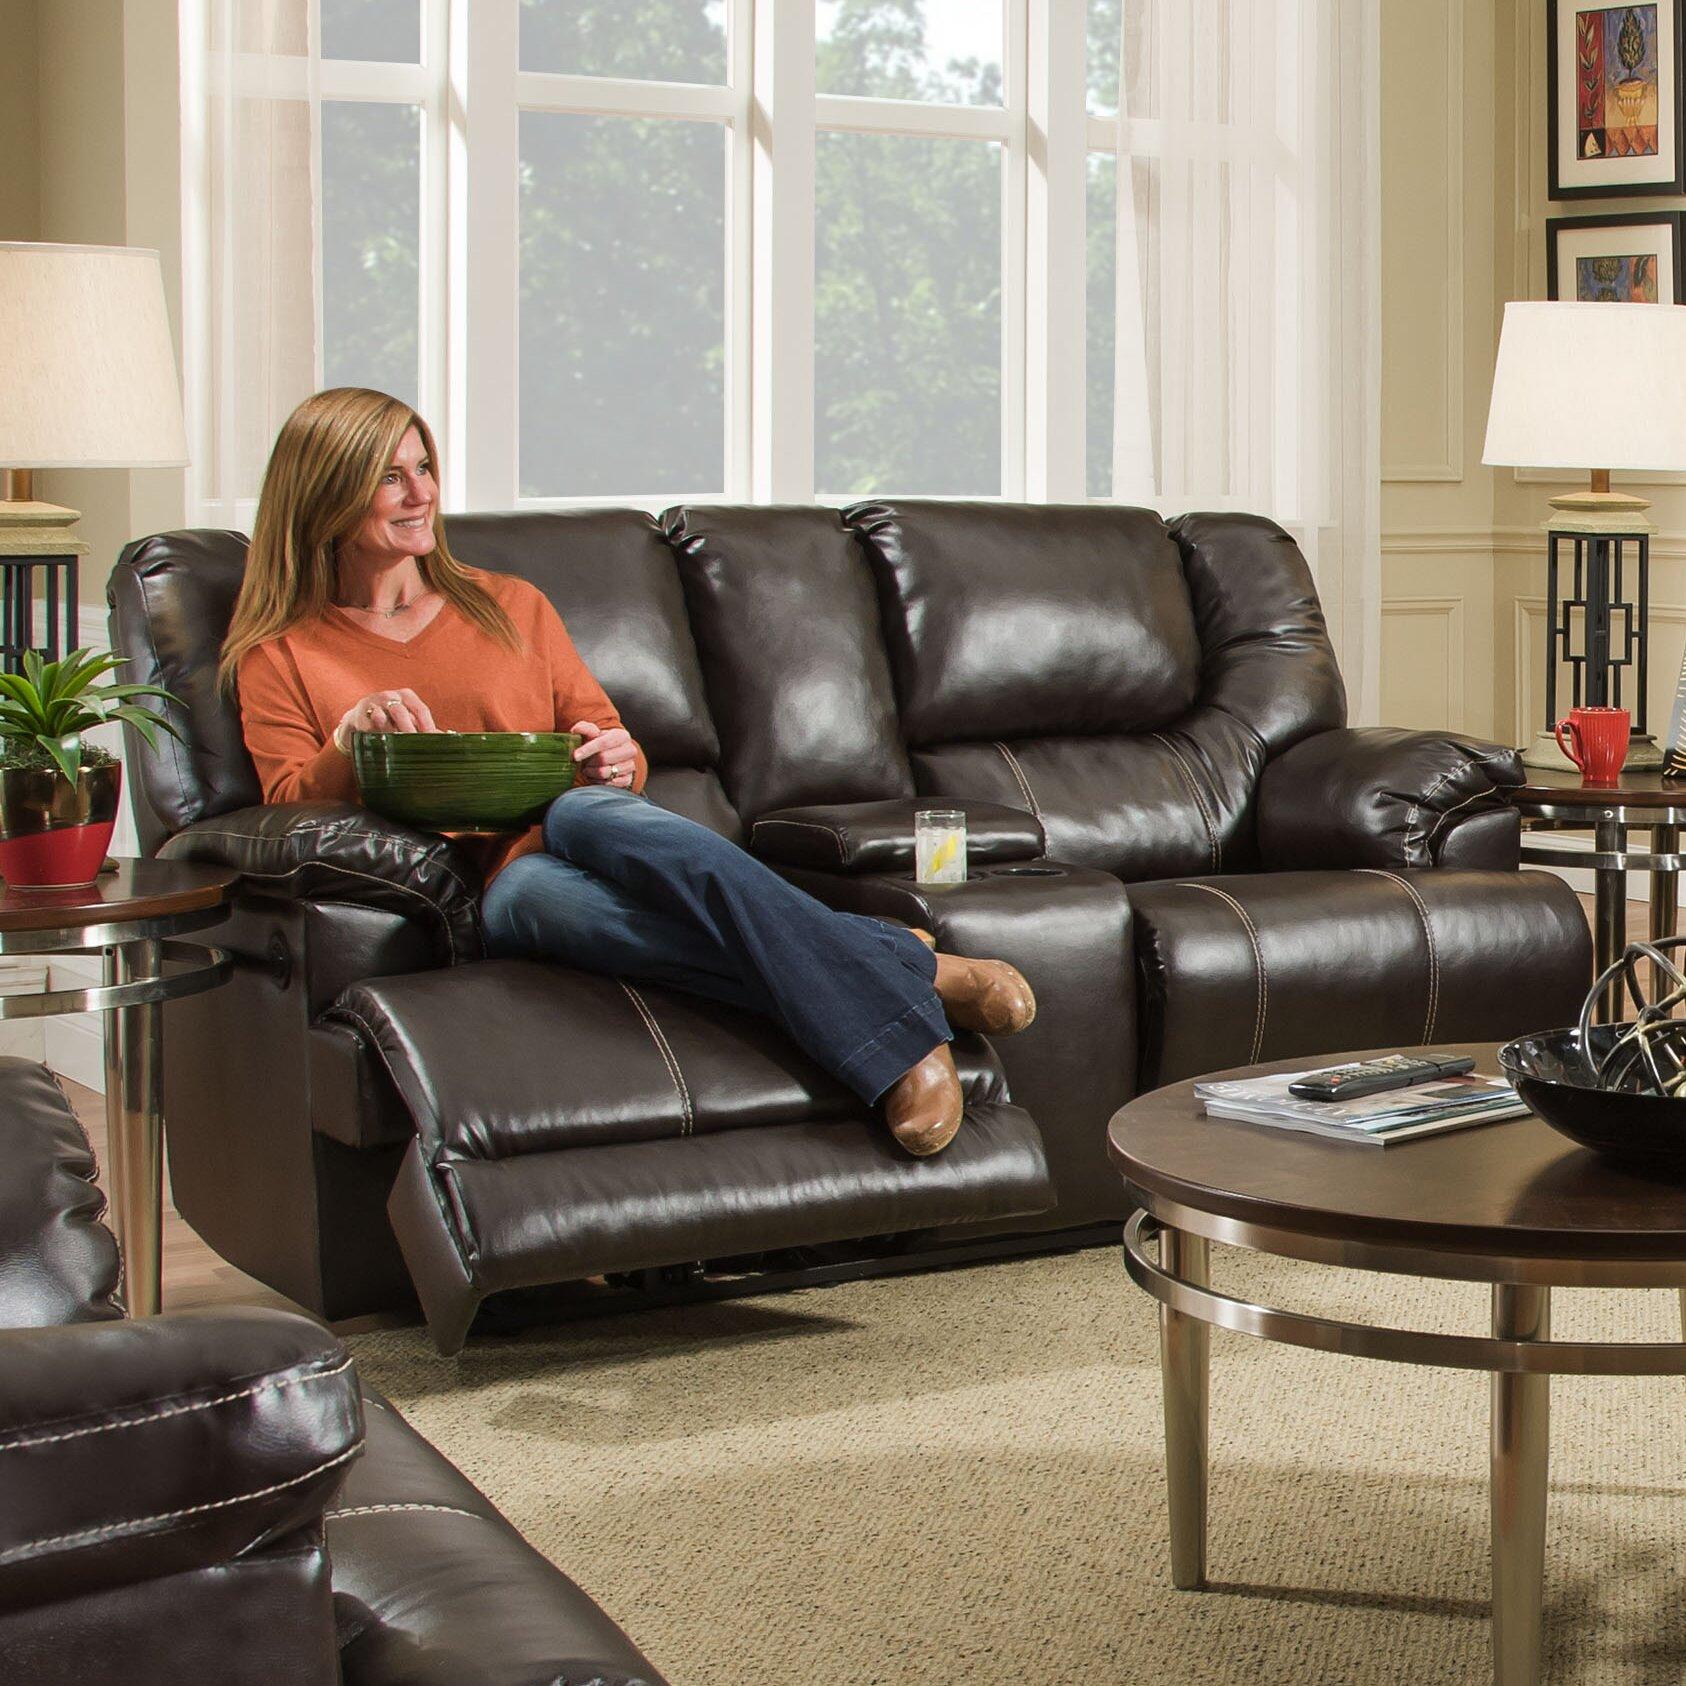 Pomona Sofa Group Brownsvilleclaimhelp